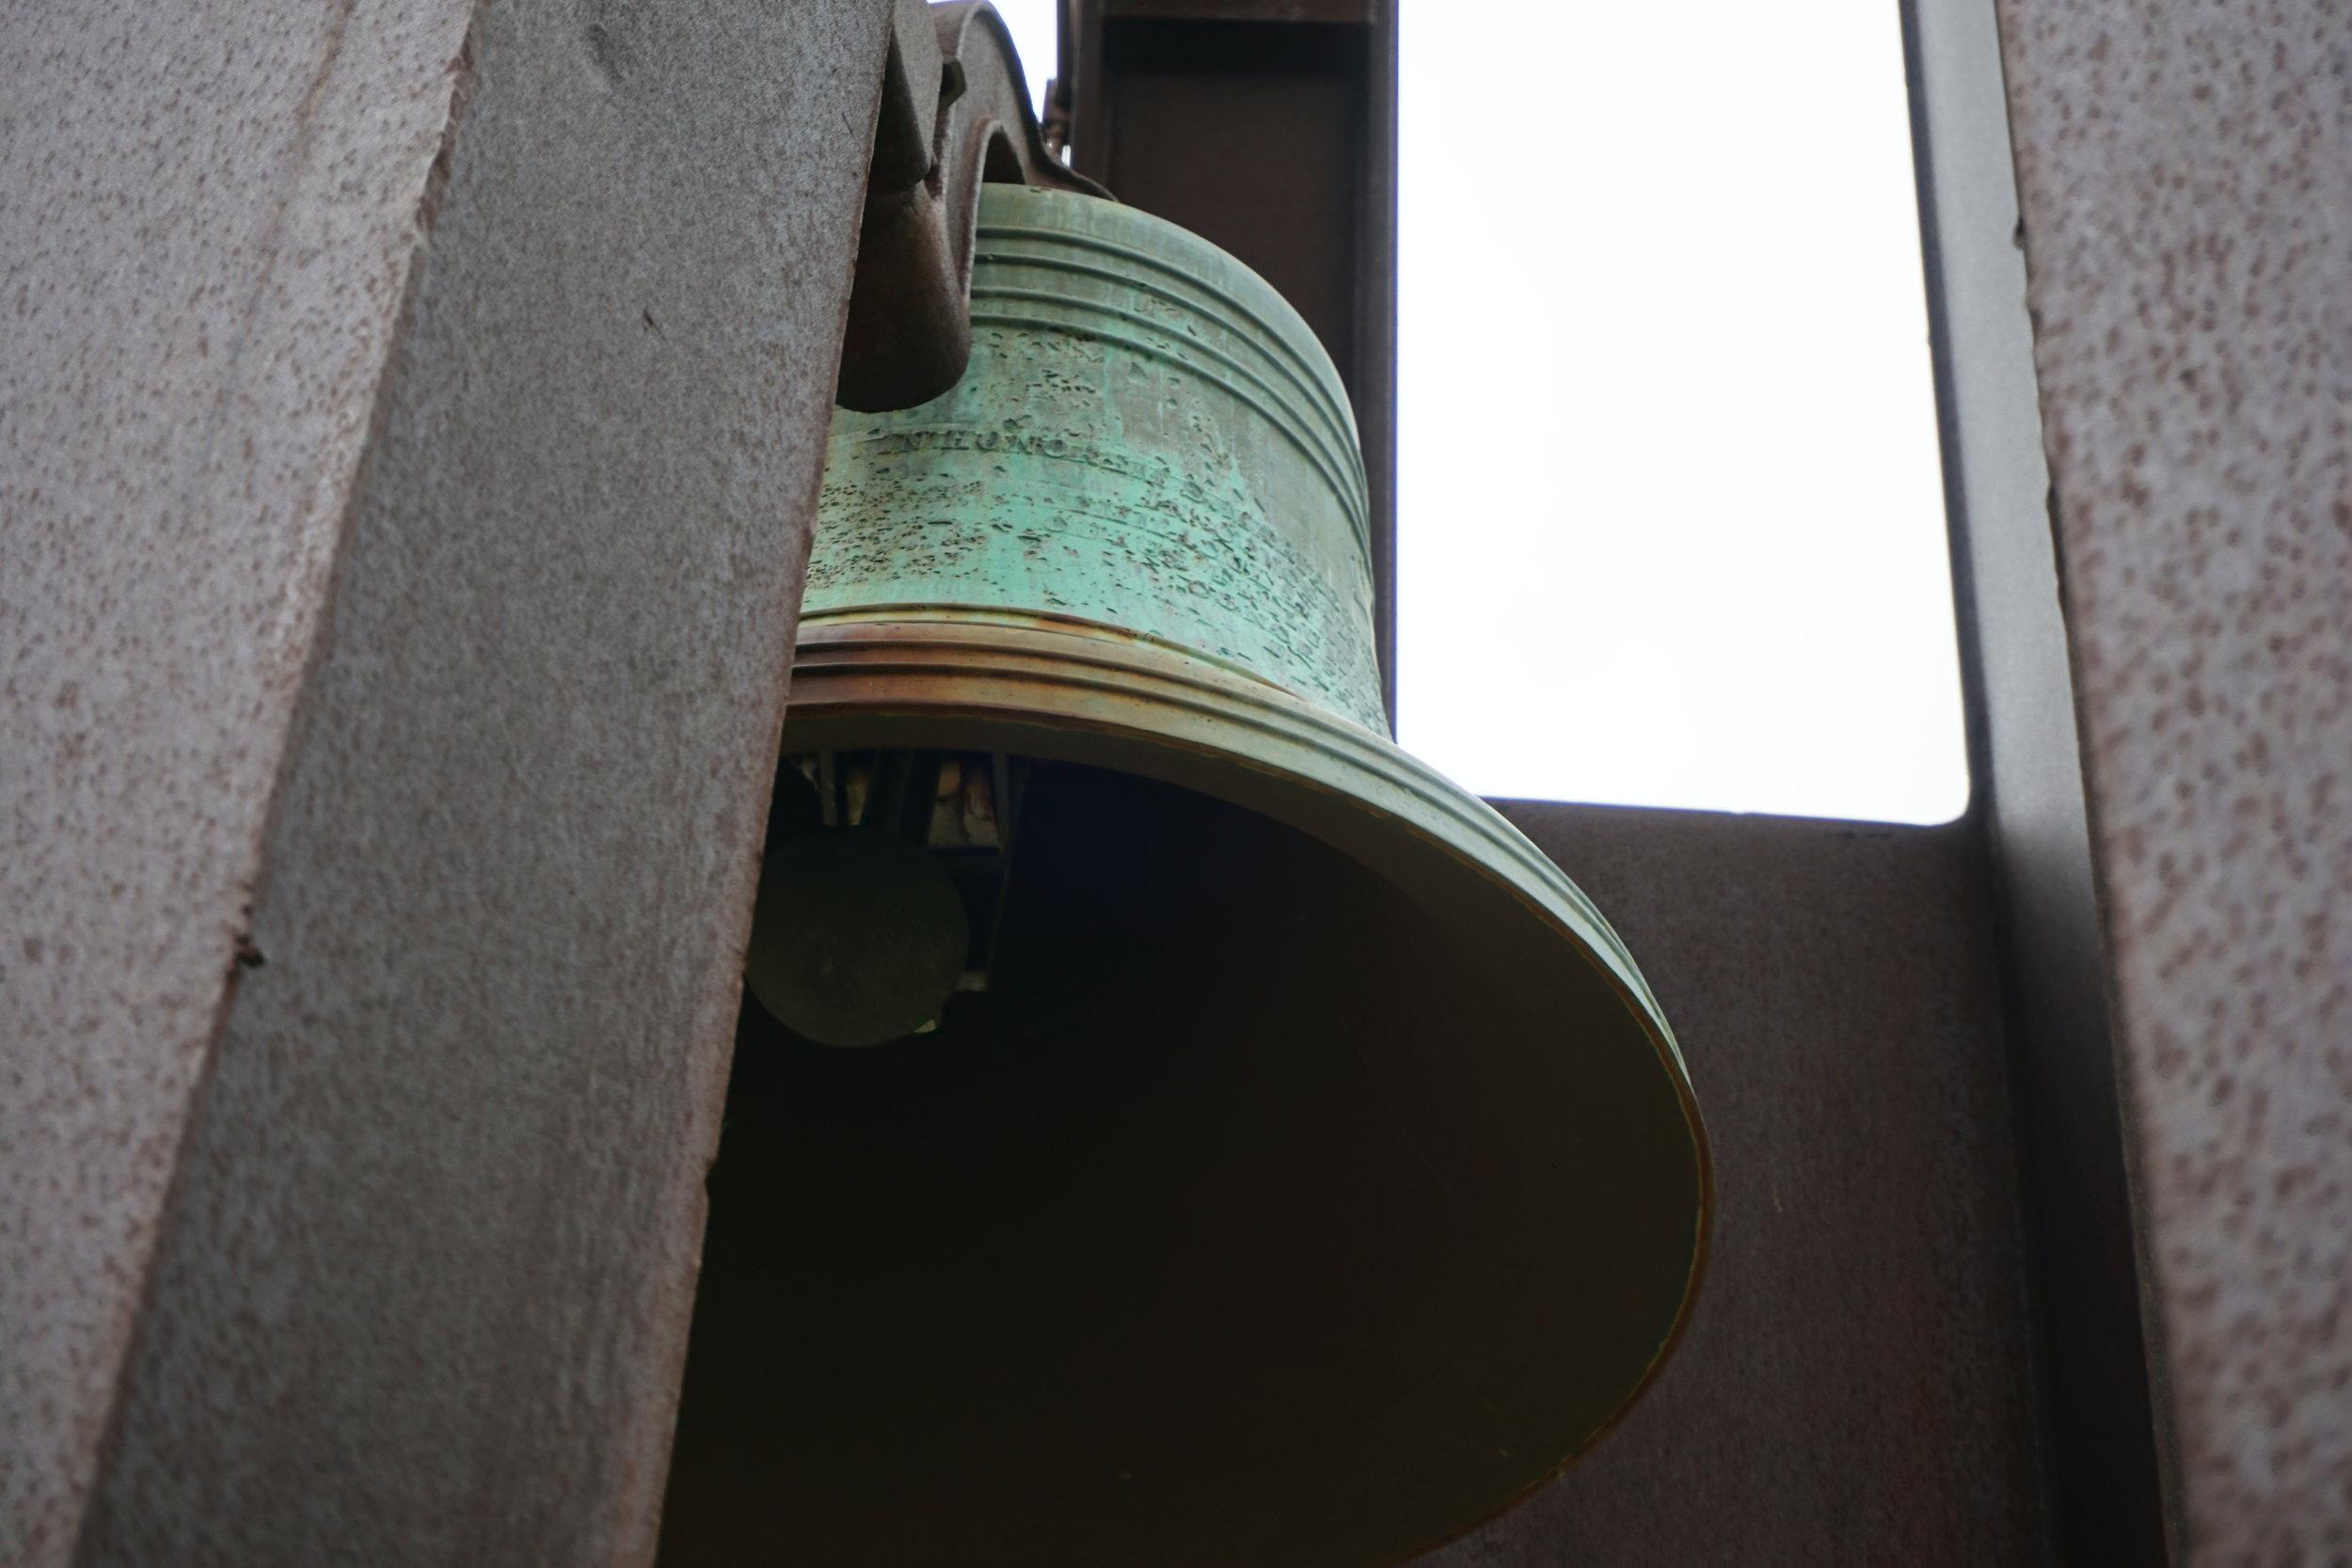 DSC02147.JPG